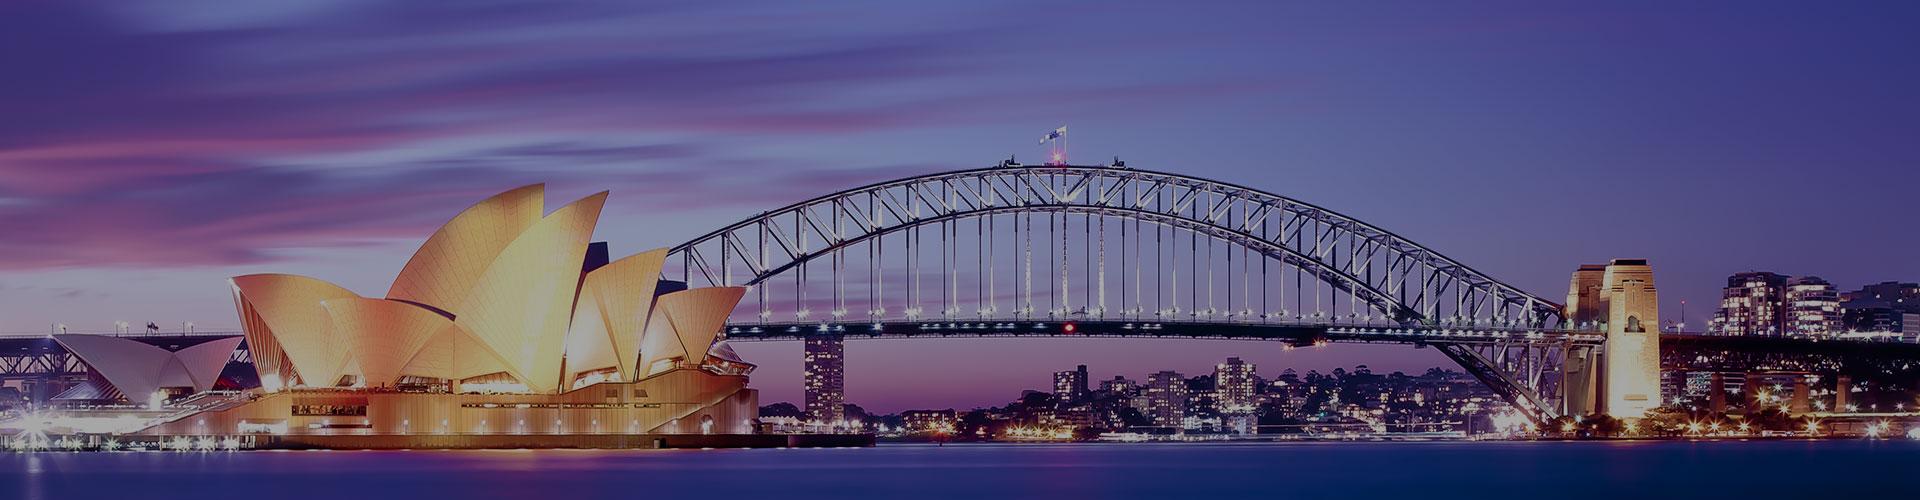 Landmark photograph of Australia